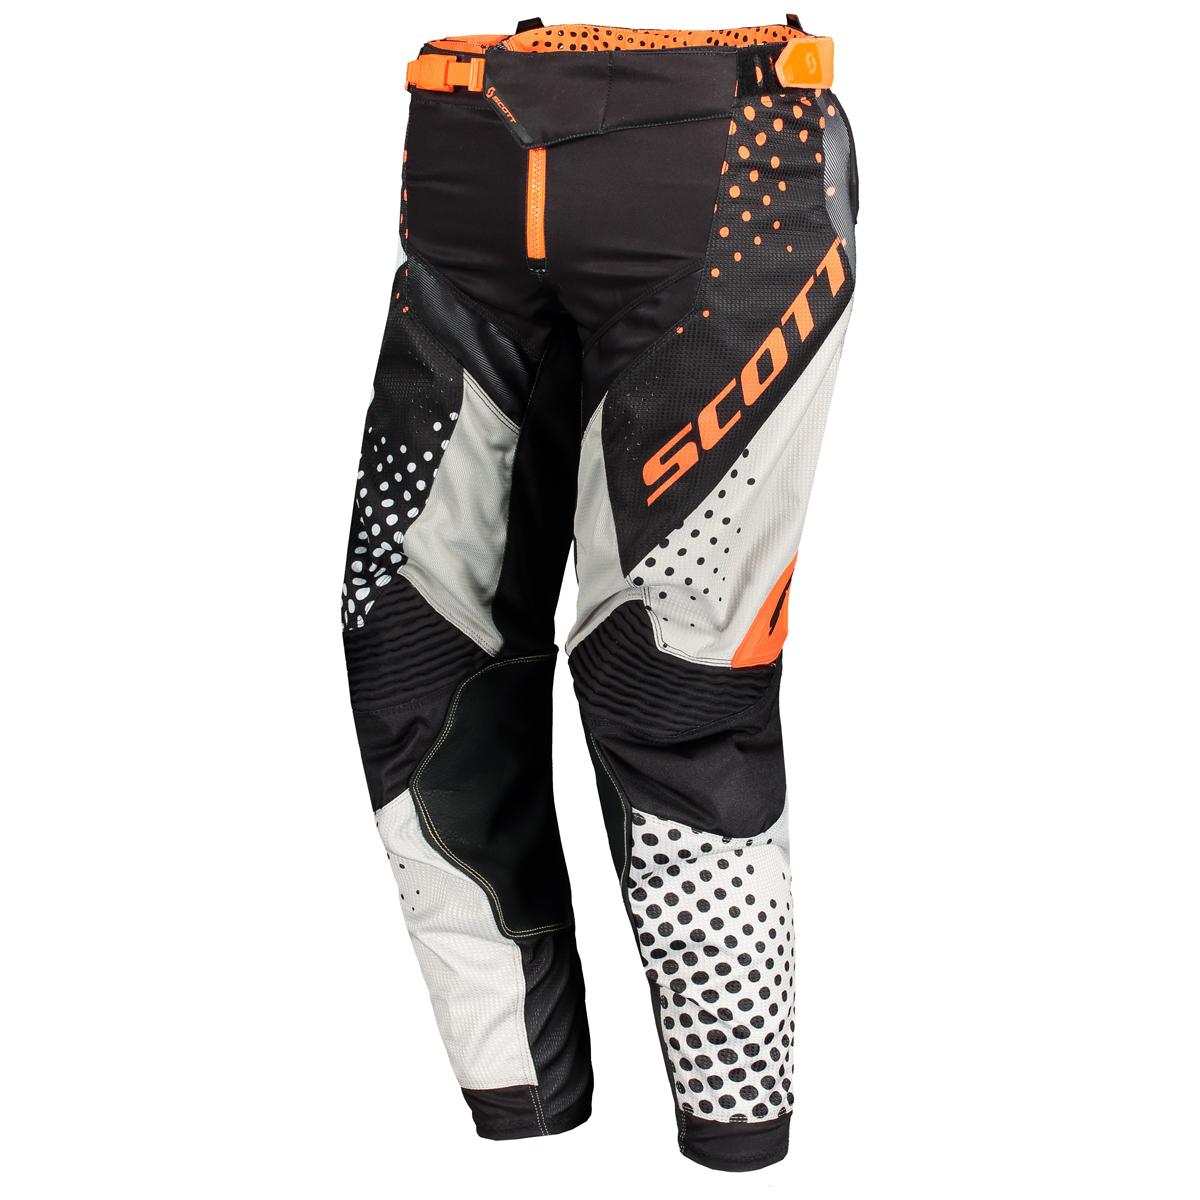 Scott 450 Angled Light MX Motocross DH Fahrrad Hose schwarz//grün 2019